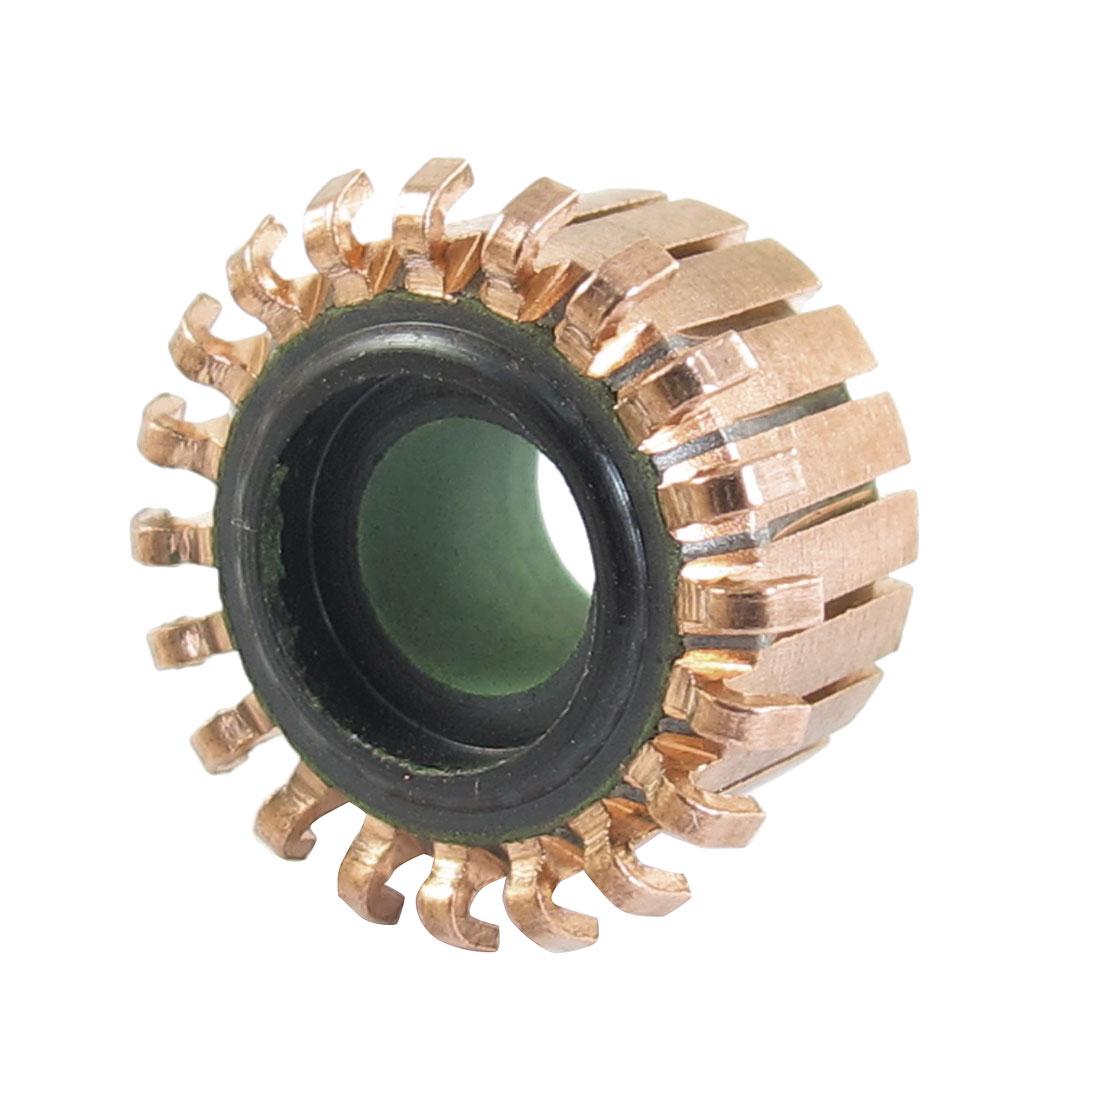 6.35mm x 15mm x 10mm 20P Copper Bars Armature Commutator for Starter Motor